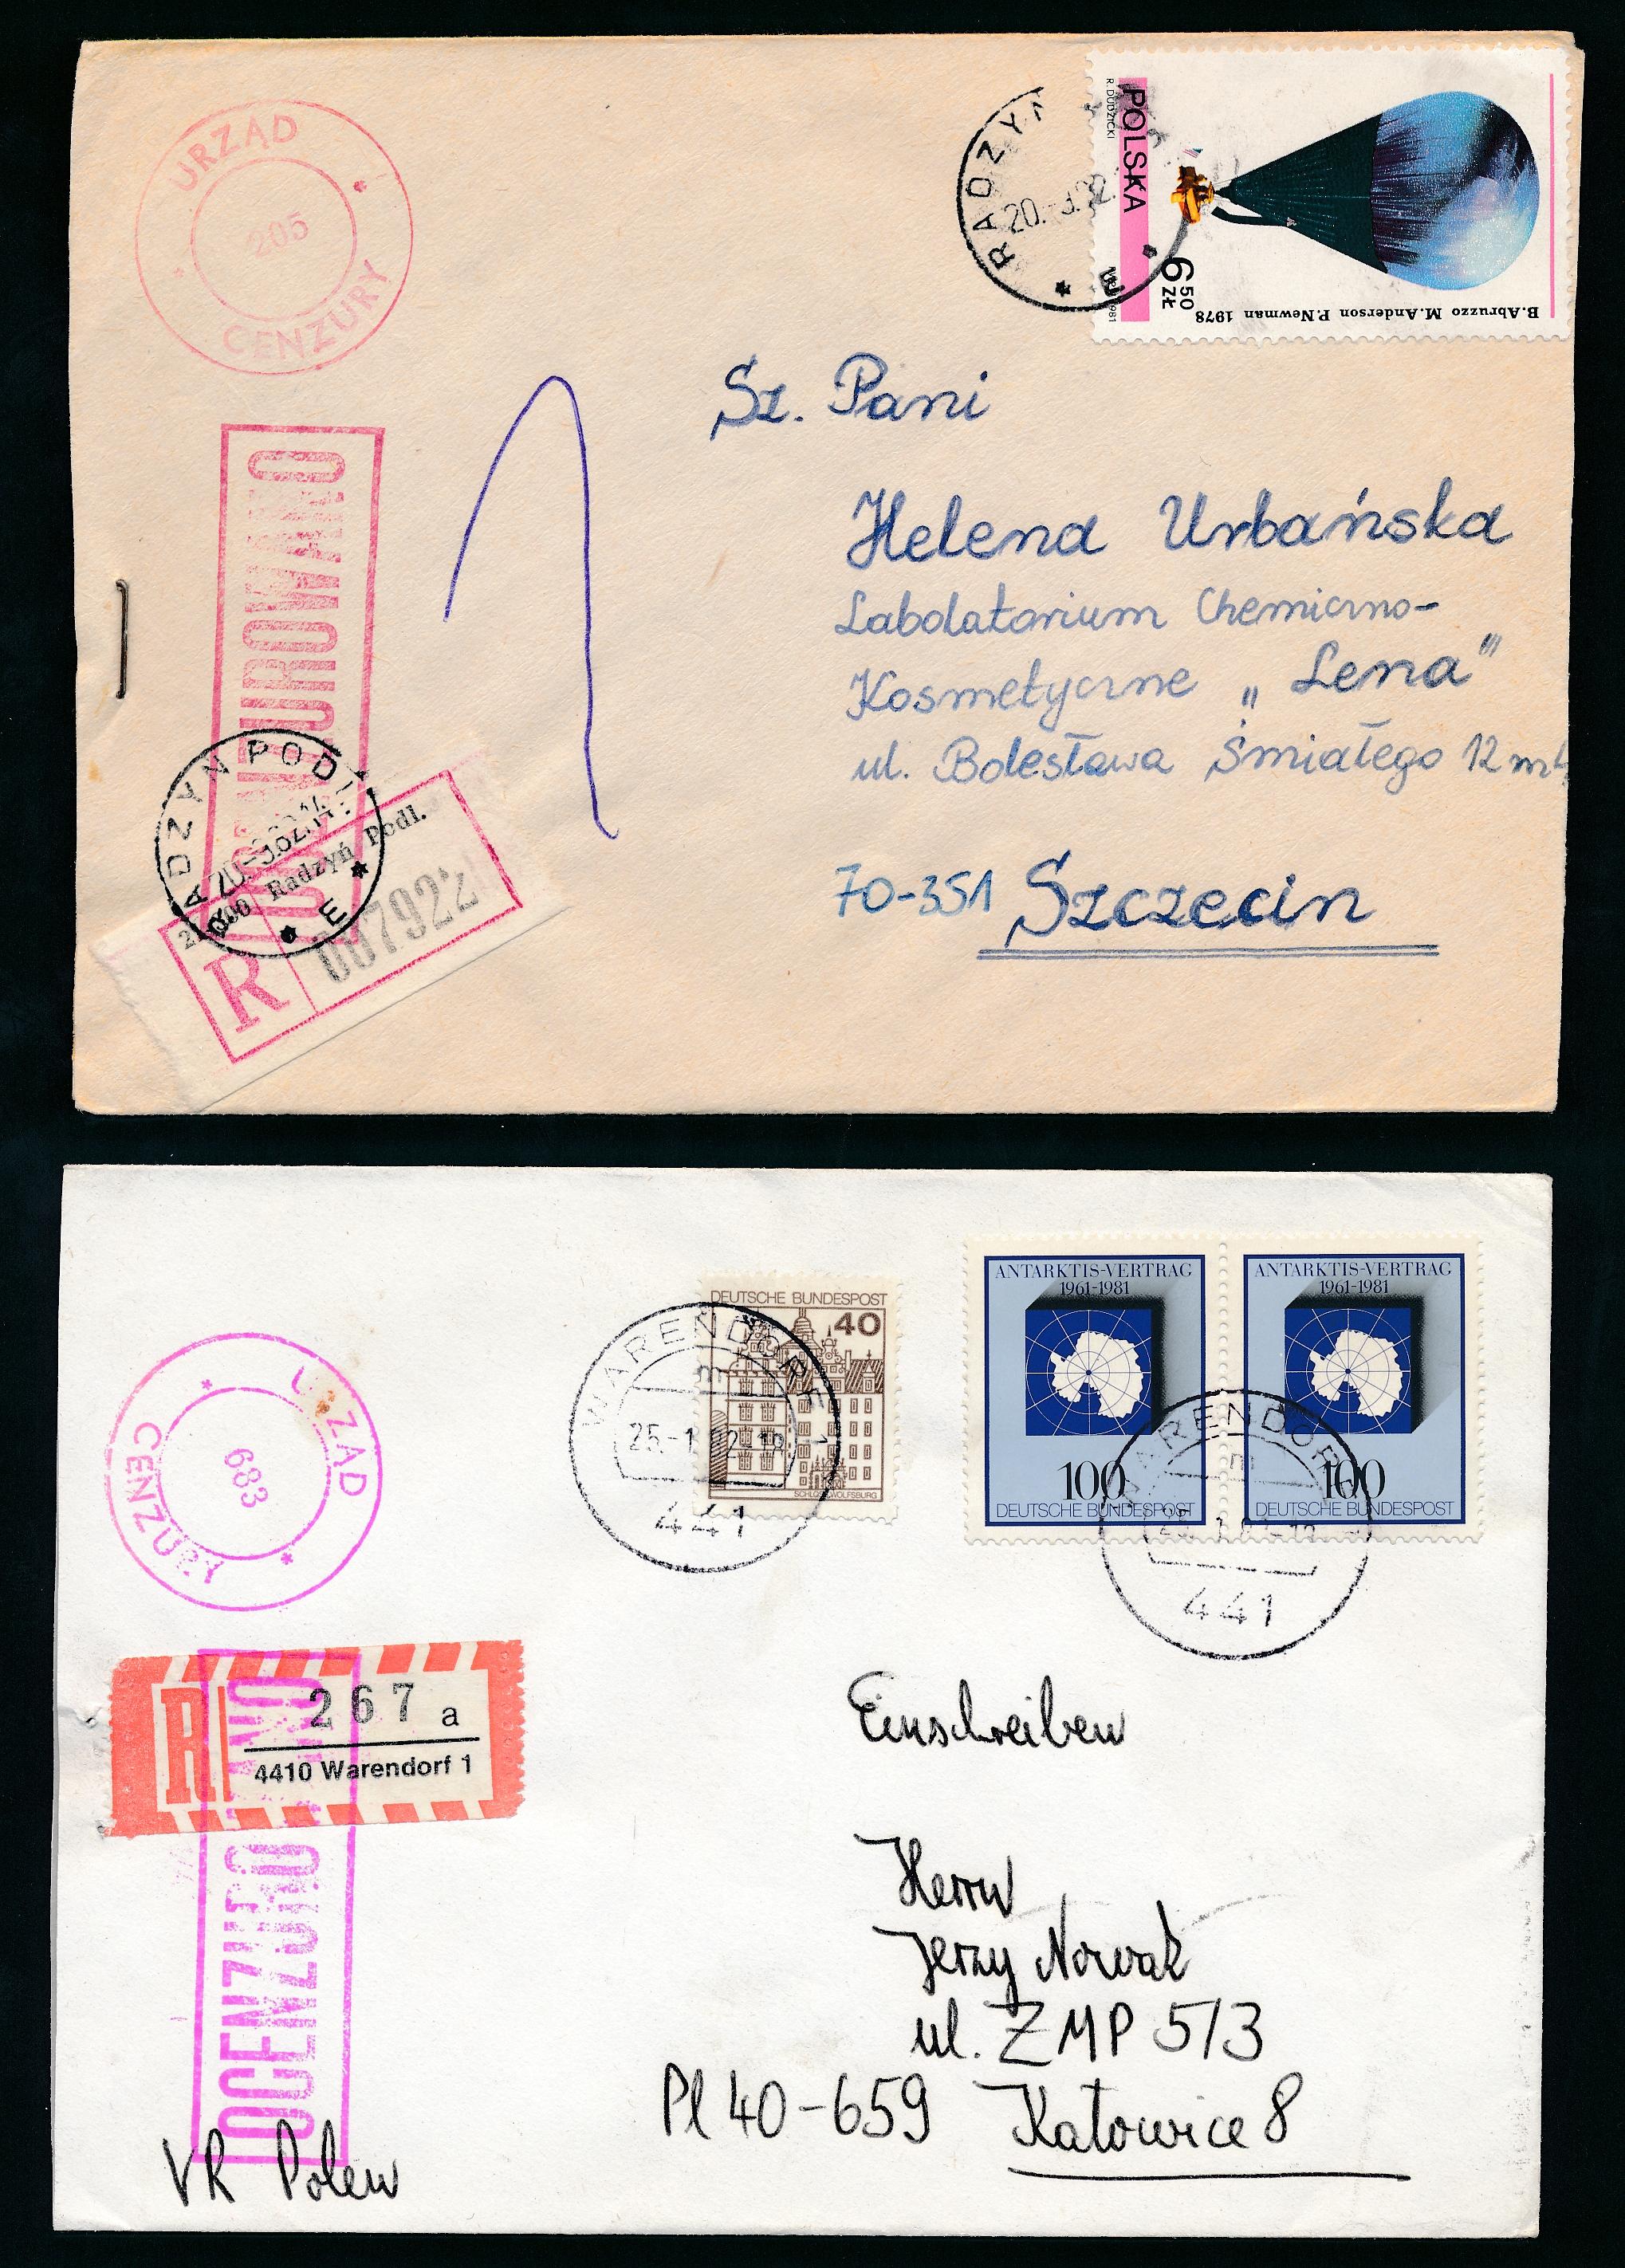 Lot 1978 - Main catalogue Lots und Sammlungen -  Peter Harlos Auctions 42. Harlos Auktion